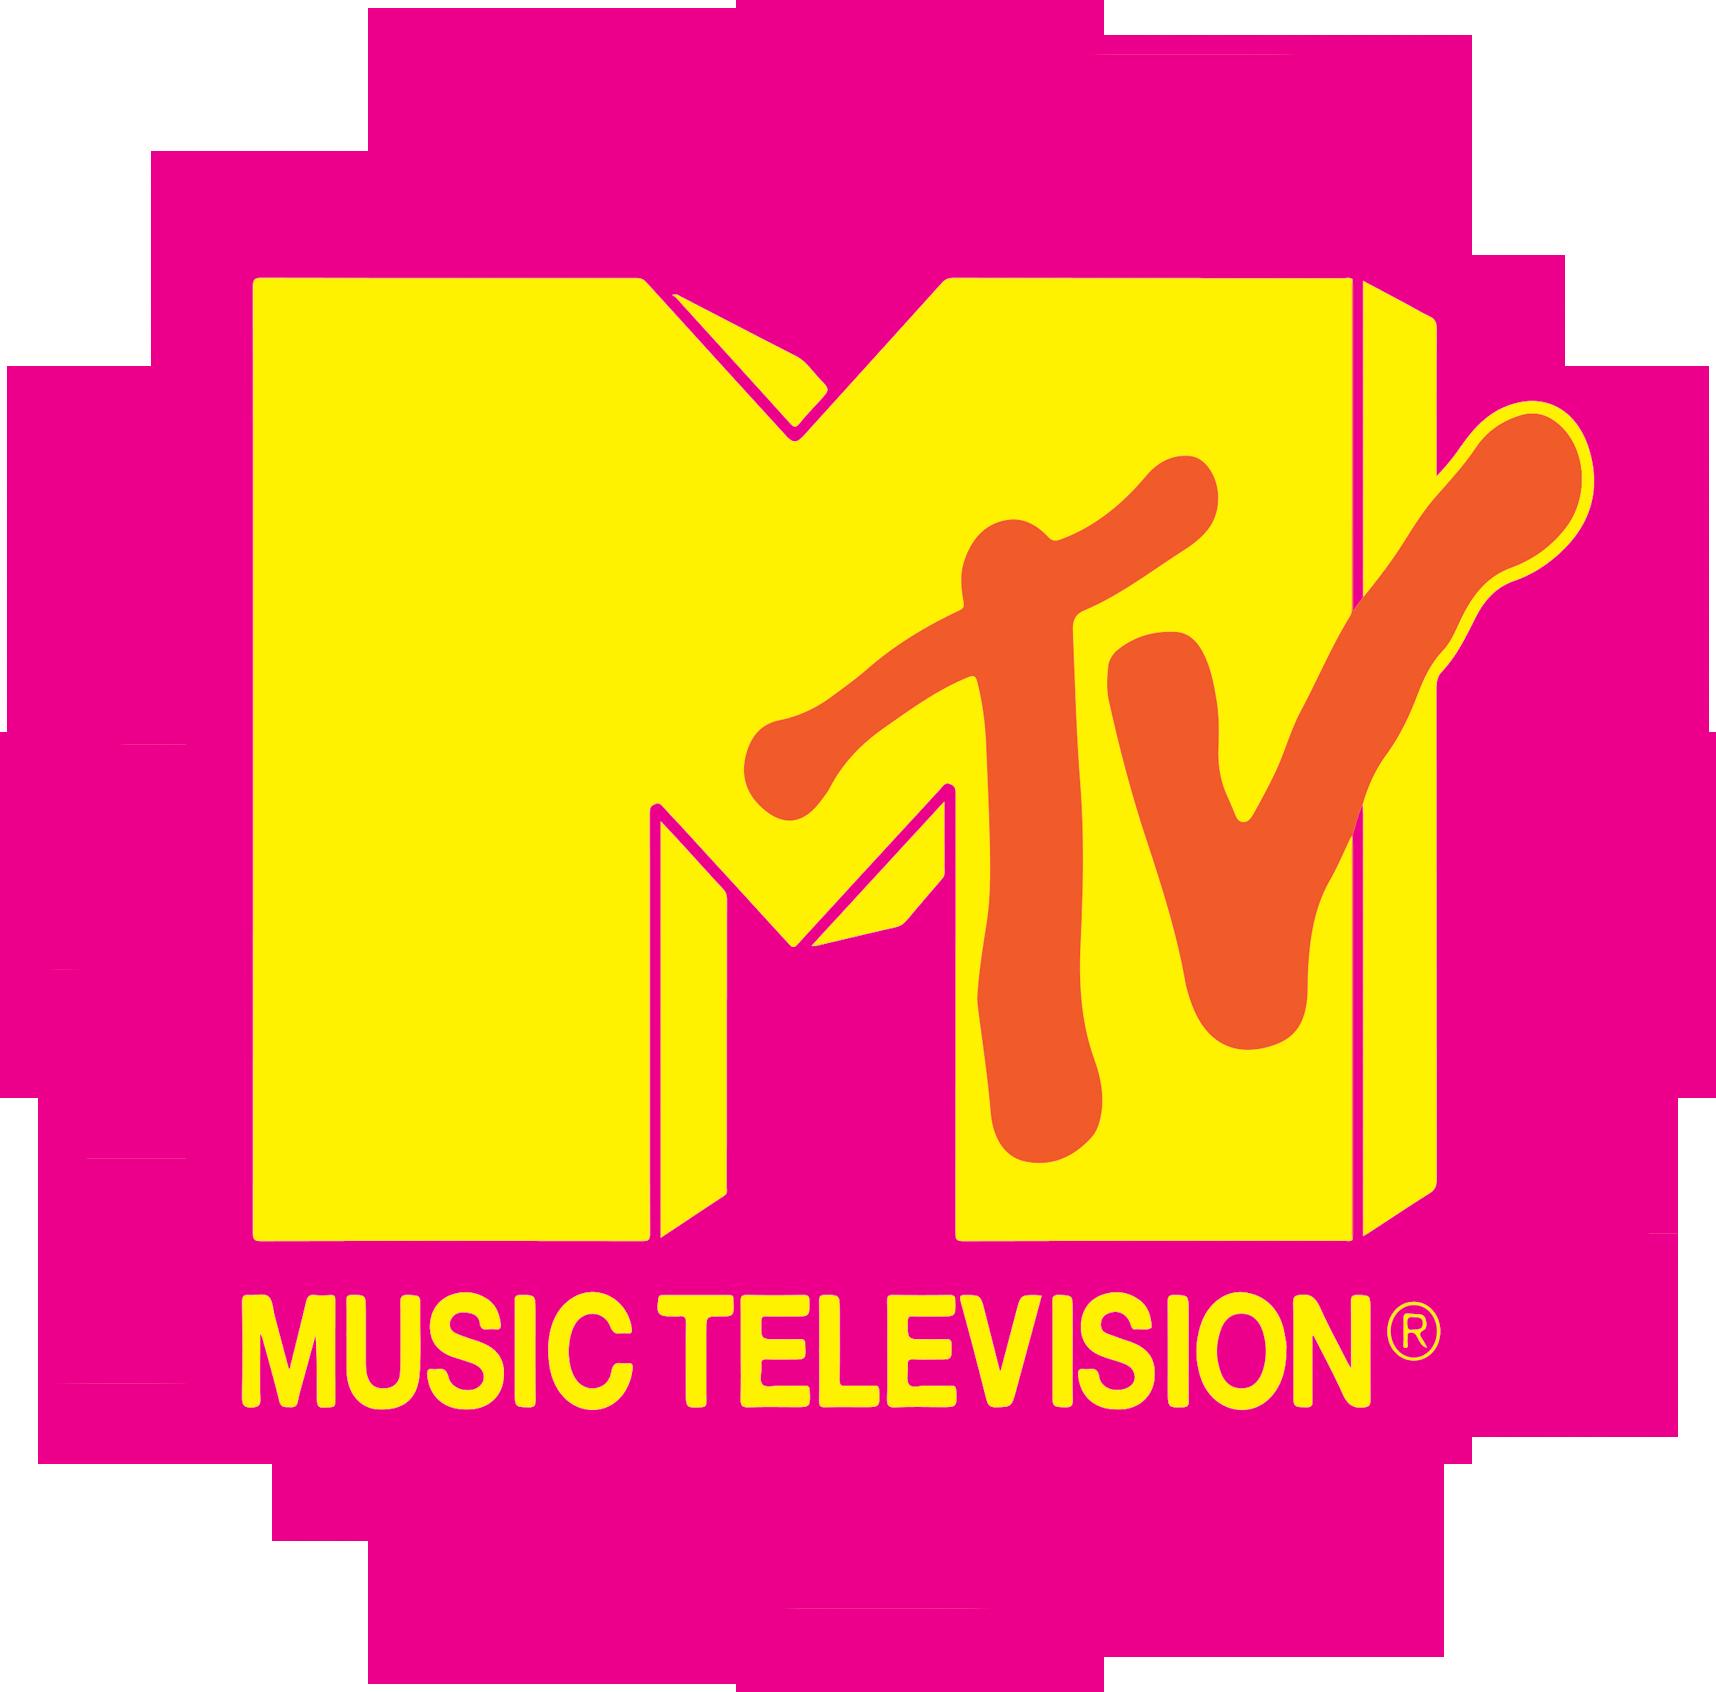 thalia world mtv png logo #3192